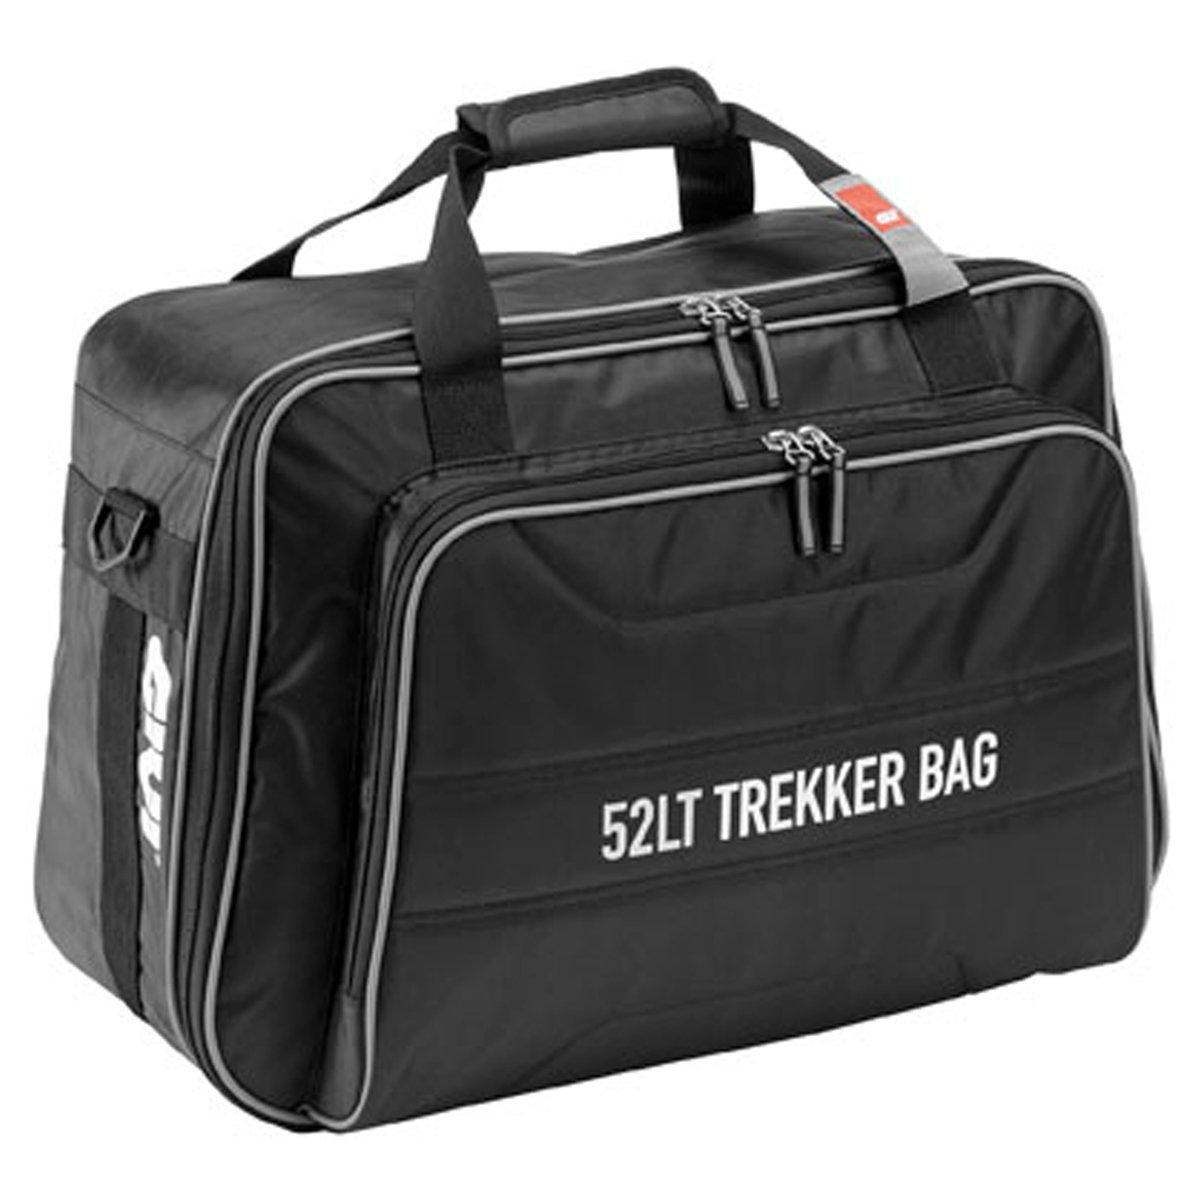 GIVI T490 tasca interna per Bauletto Trekker TRK52, Nero, 40